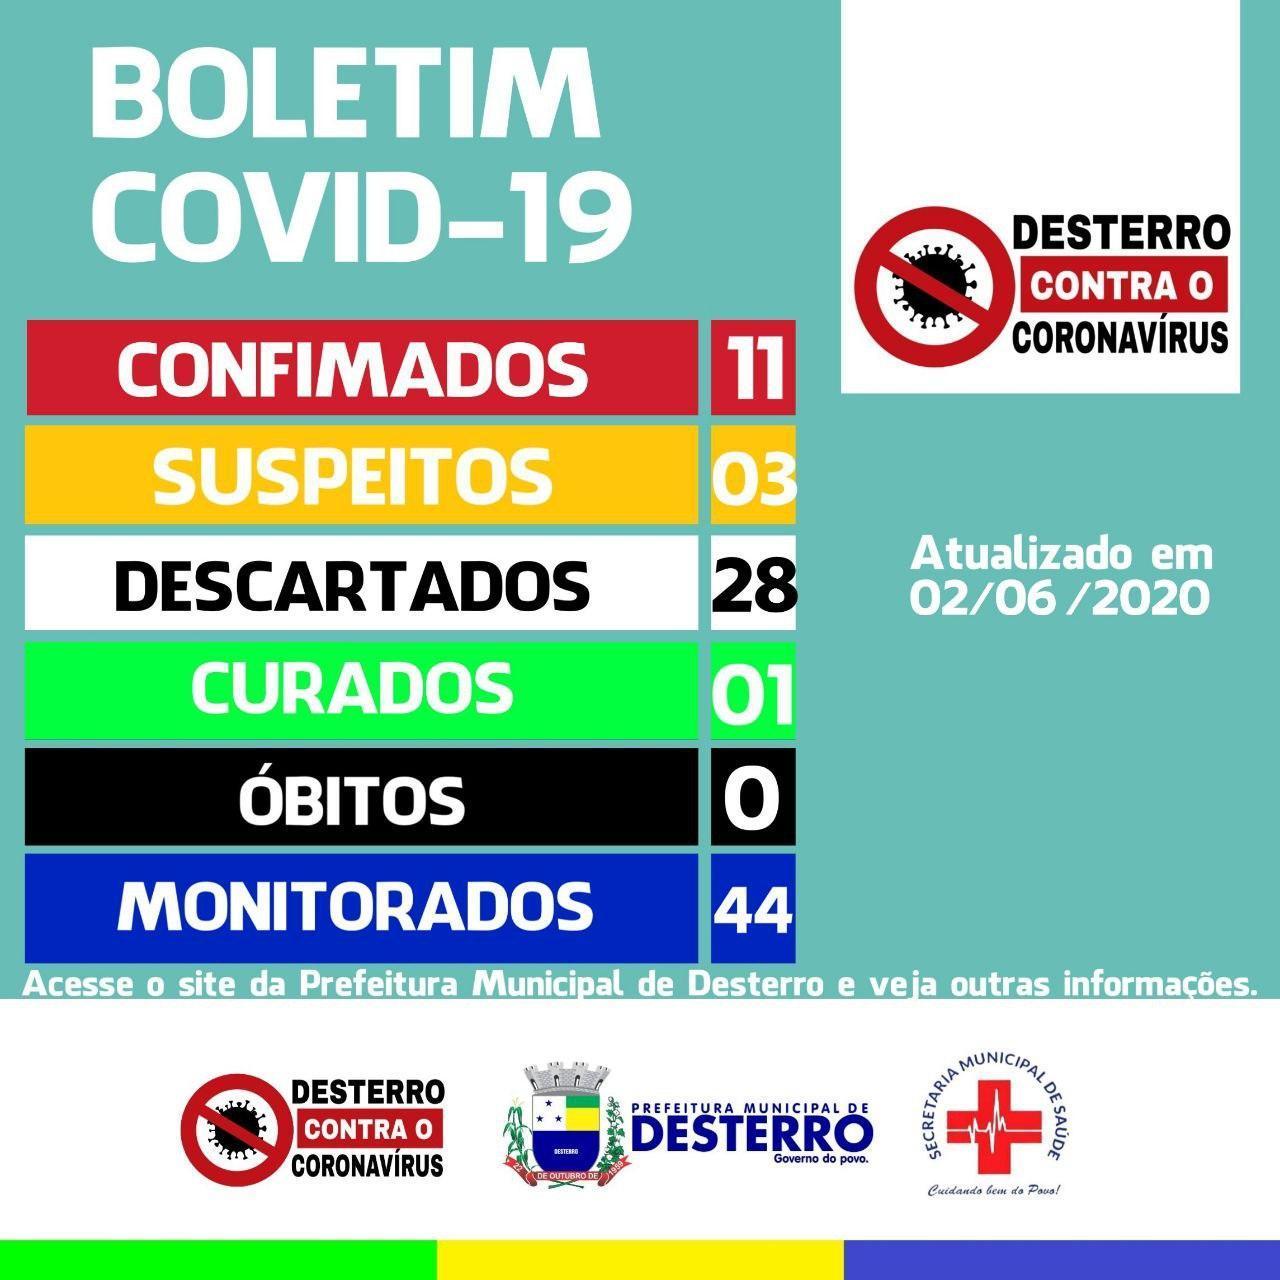 Boletim Covid-19 (02/06/2020)